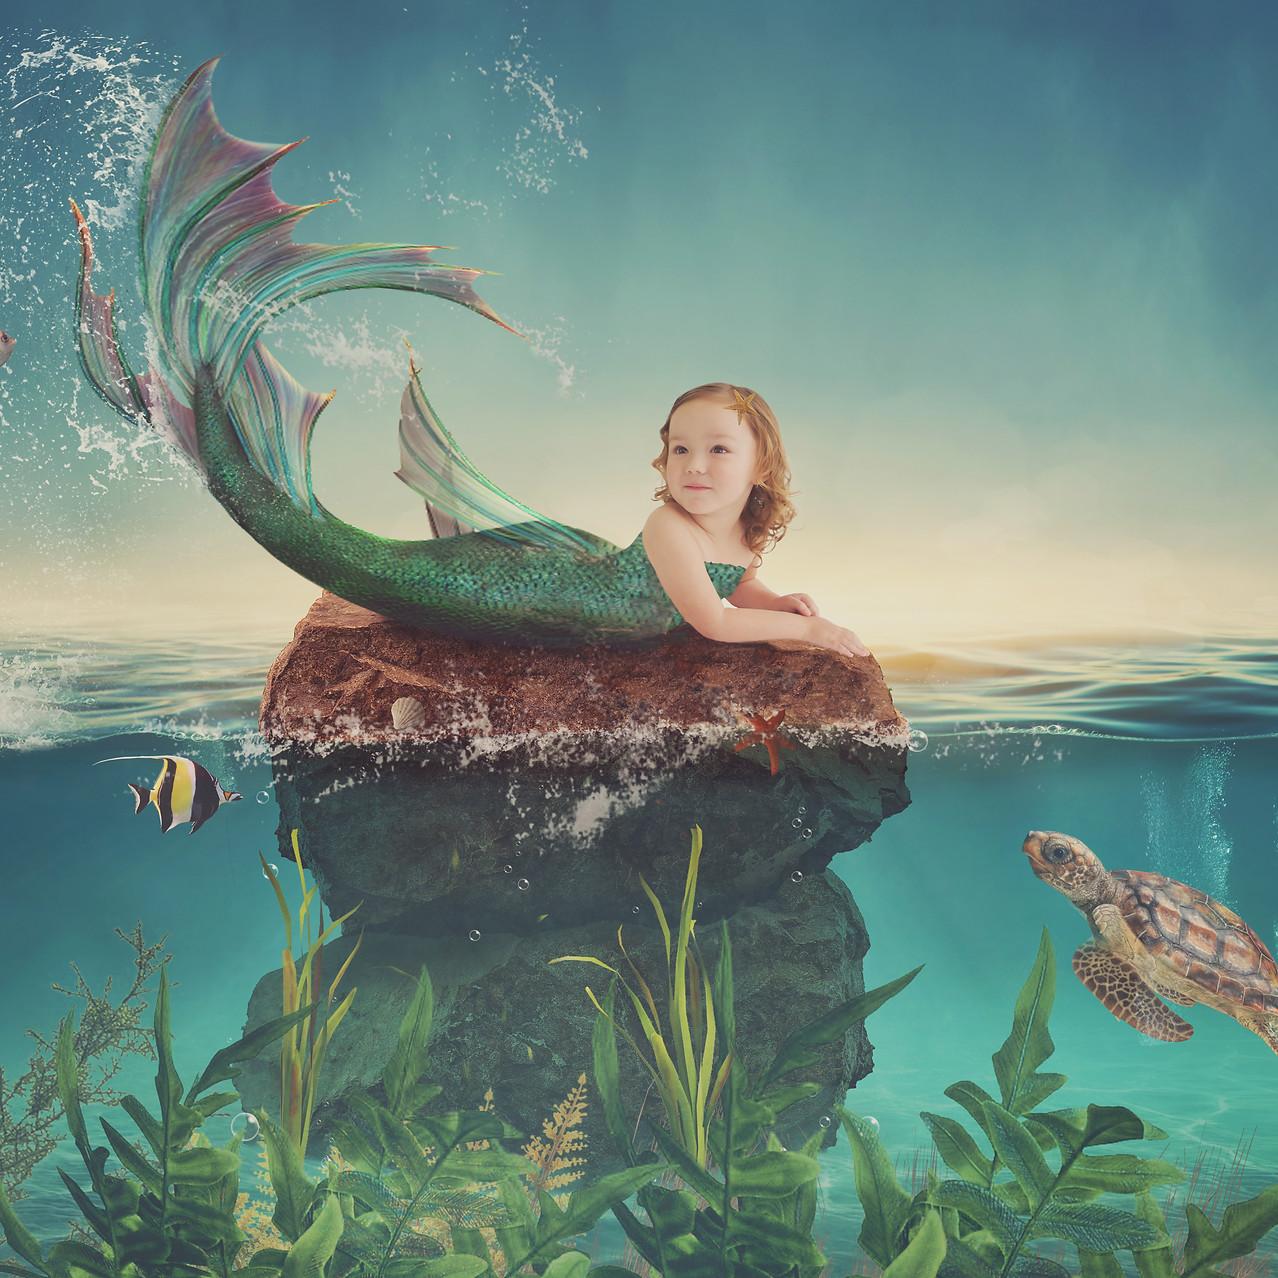 Mermaid Girl. Creative Children's Photography fantasy photoshoot, Dream Alice Photography & Art, Gold Coast